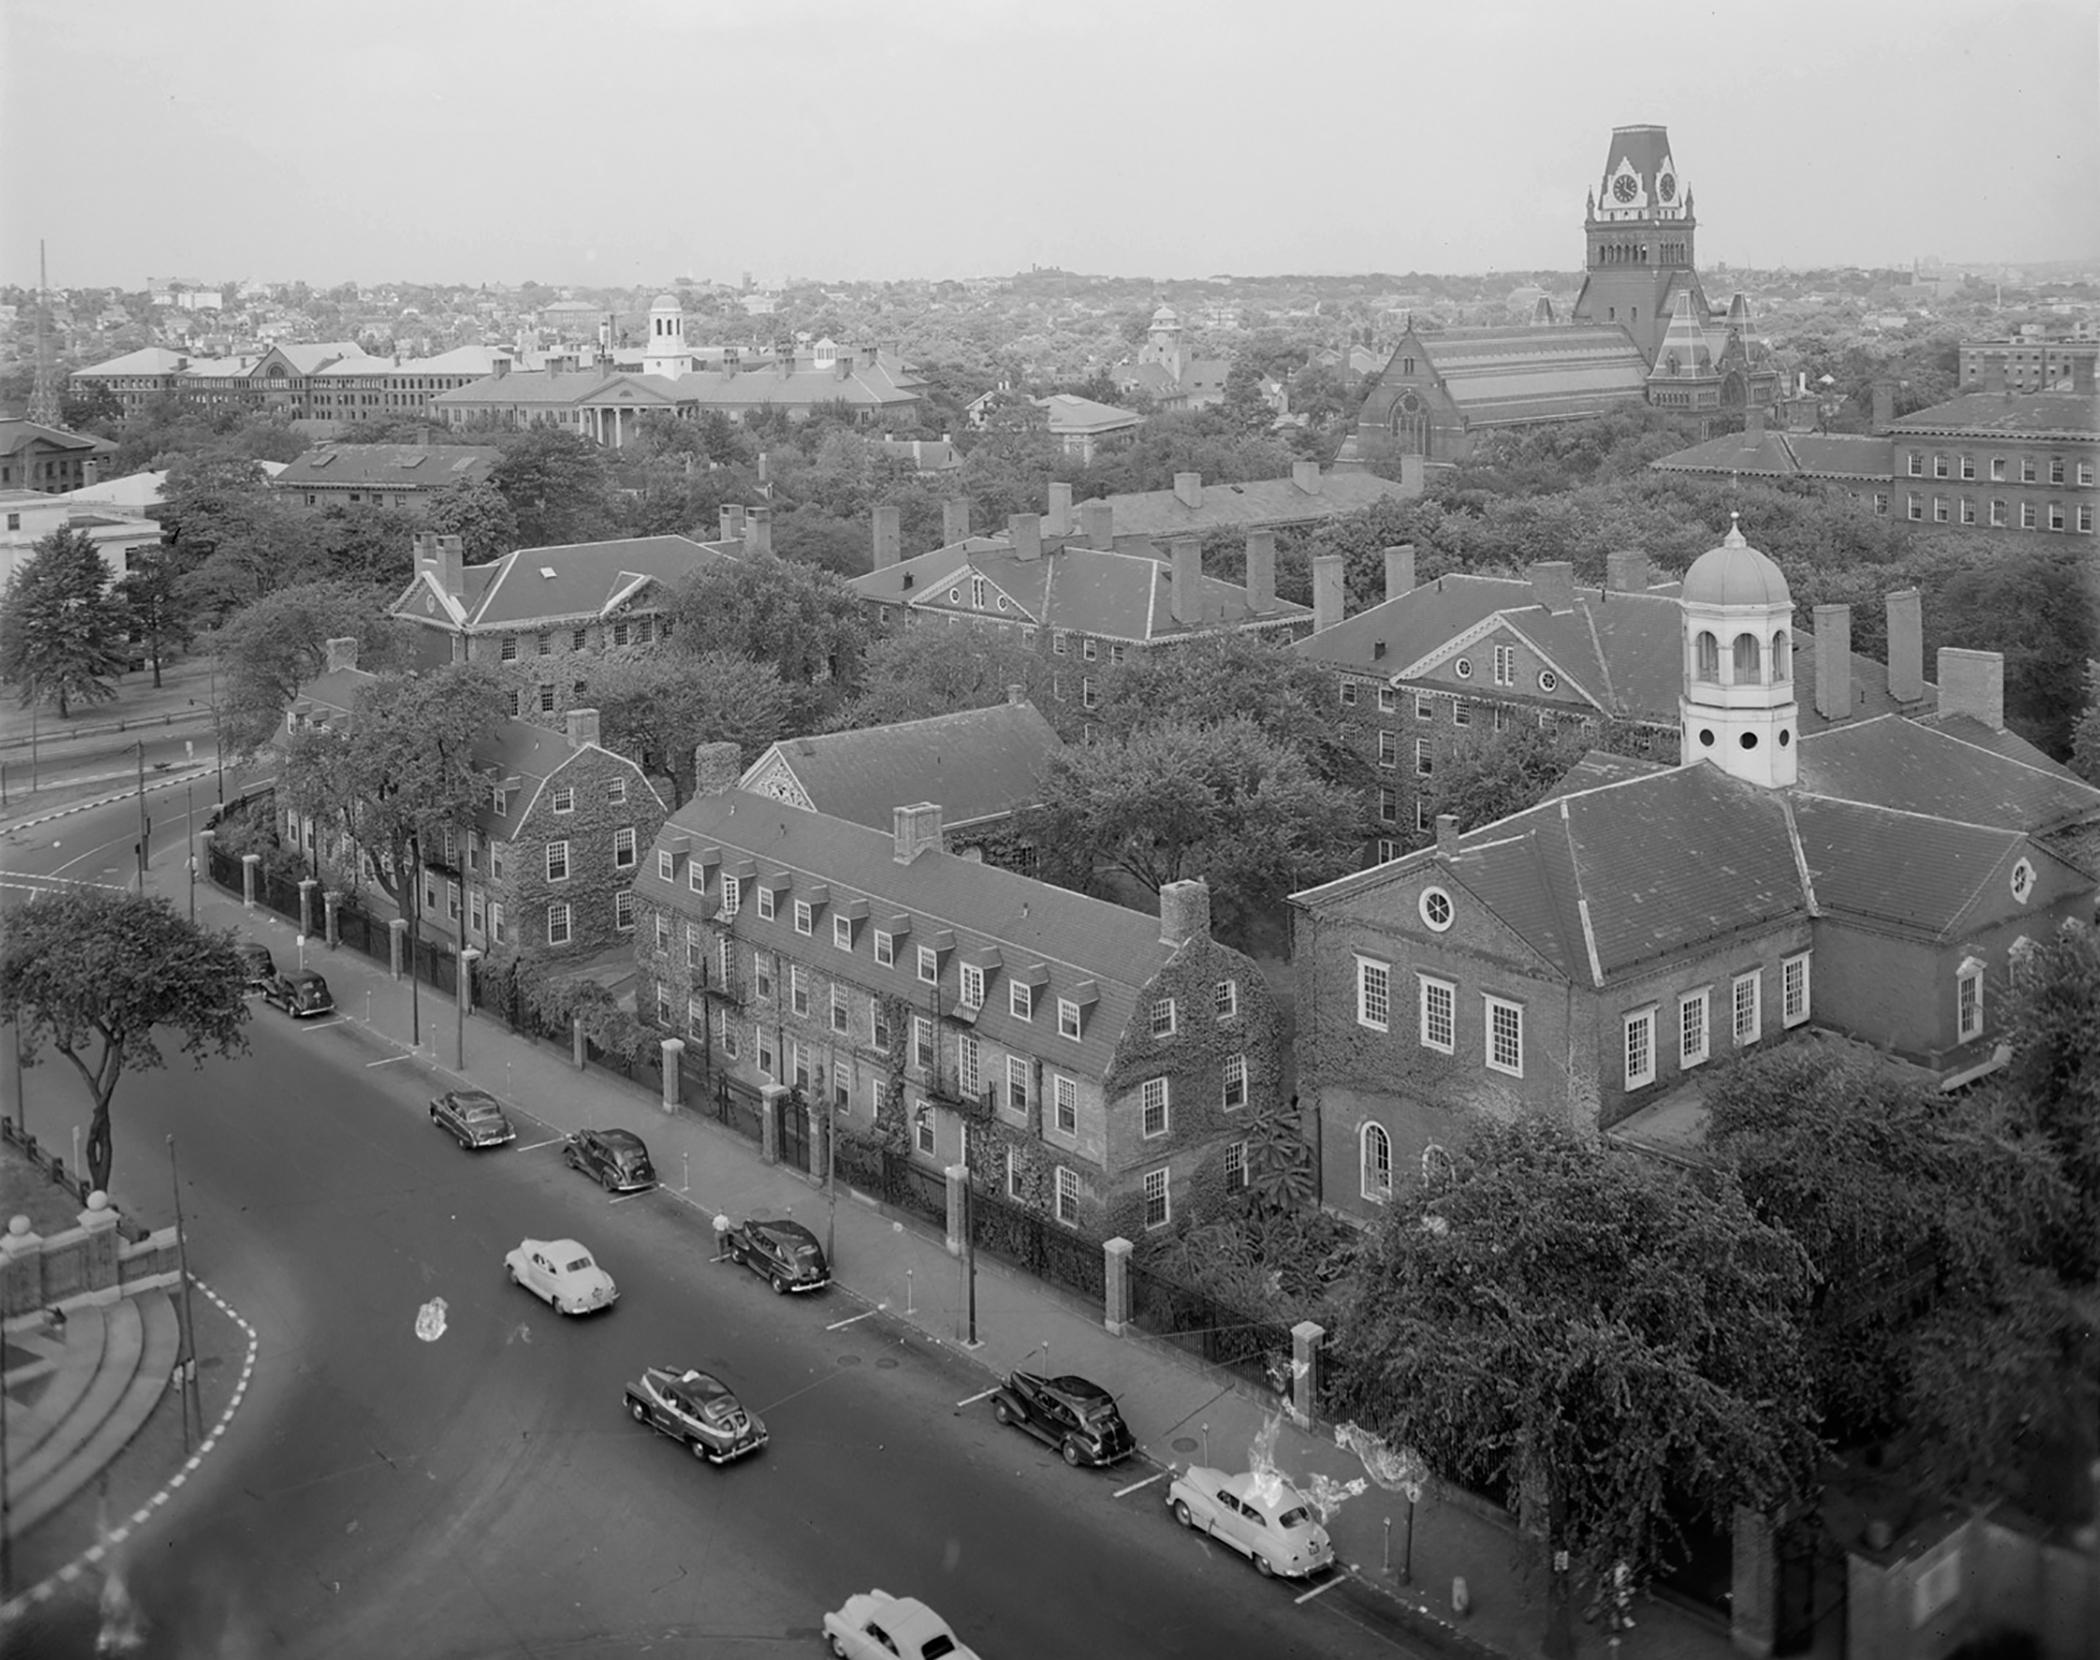 Bird's eye view of Harvard campus, ca. 1950s